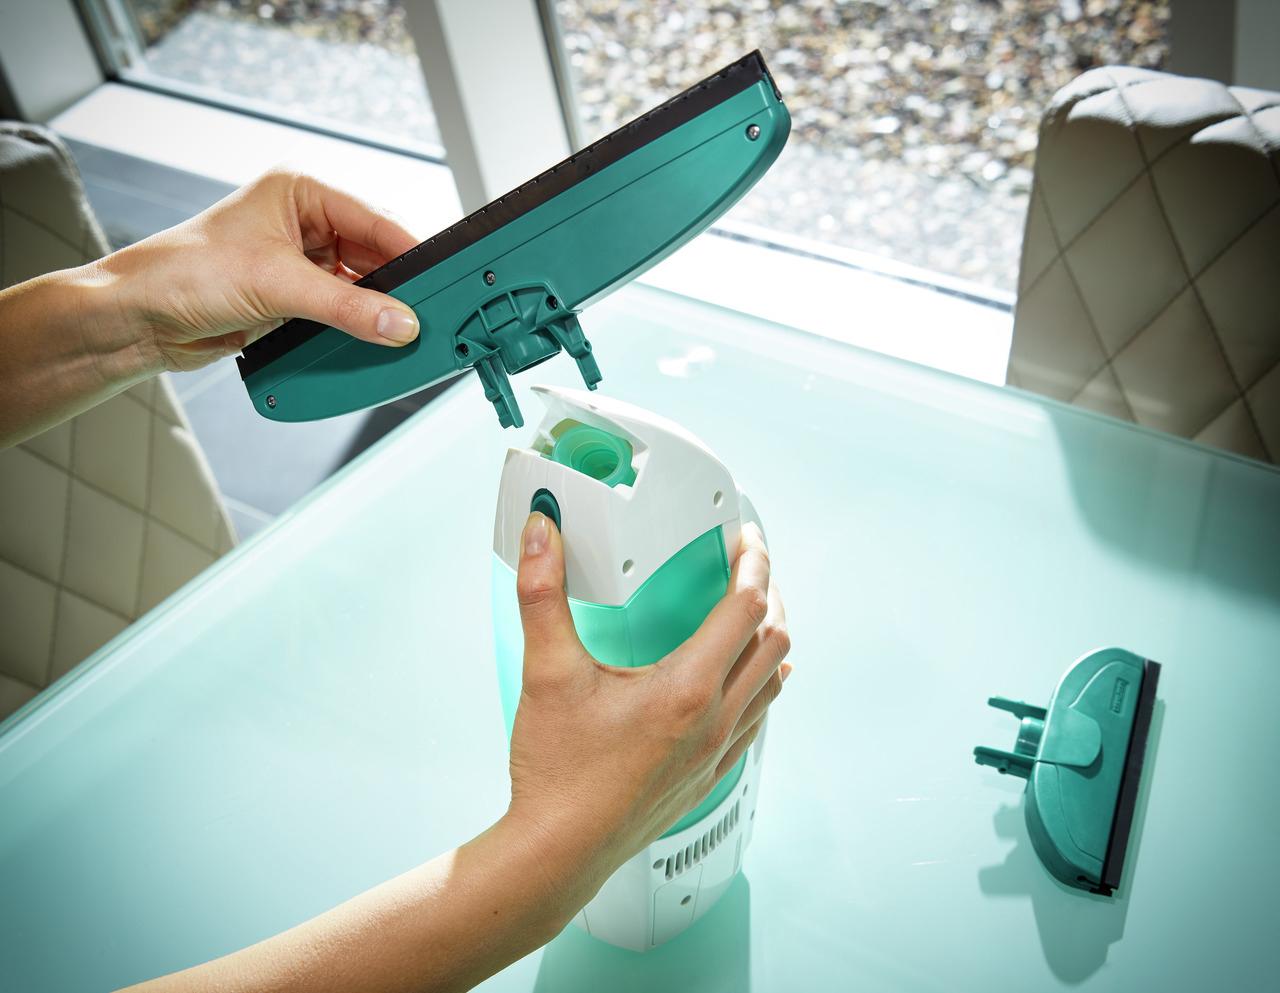 Leifheit Fenstersauger Dry & Clean inkl. schmaler Saugdüse Bild 2